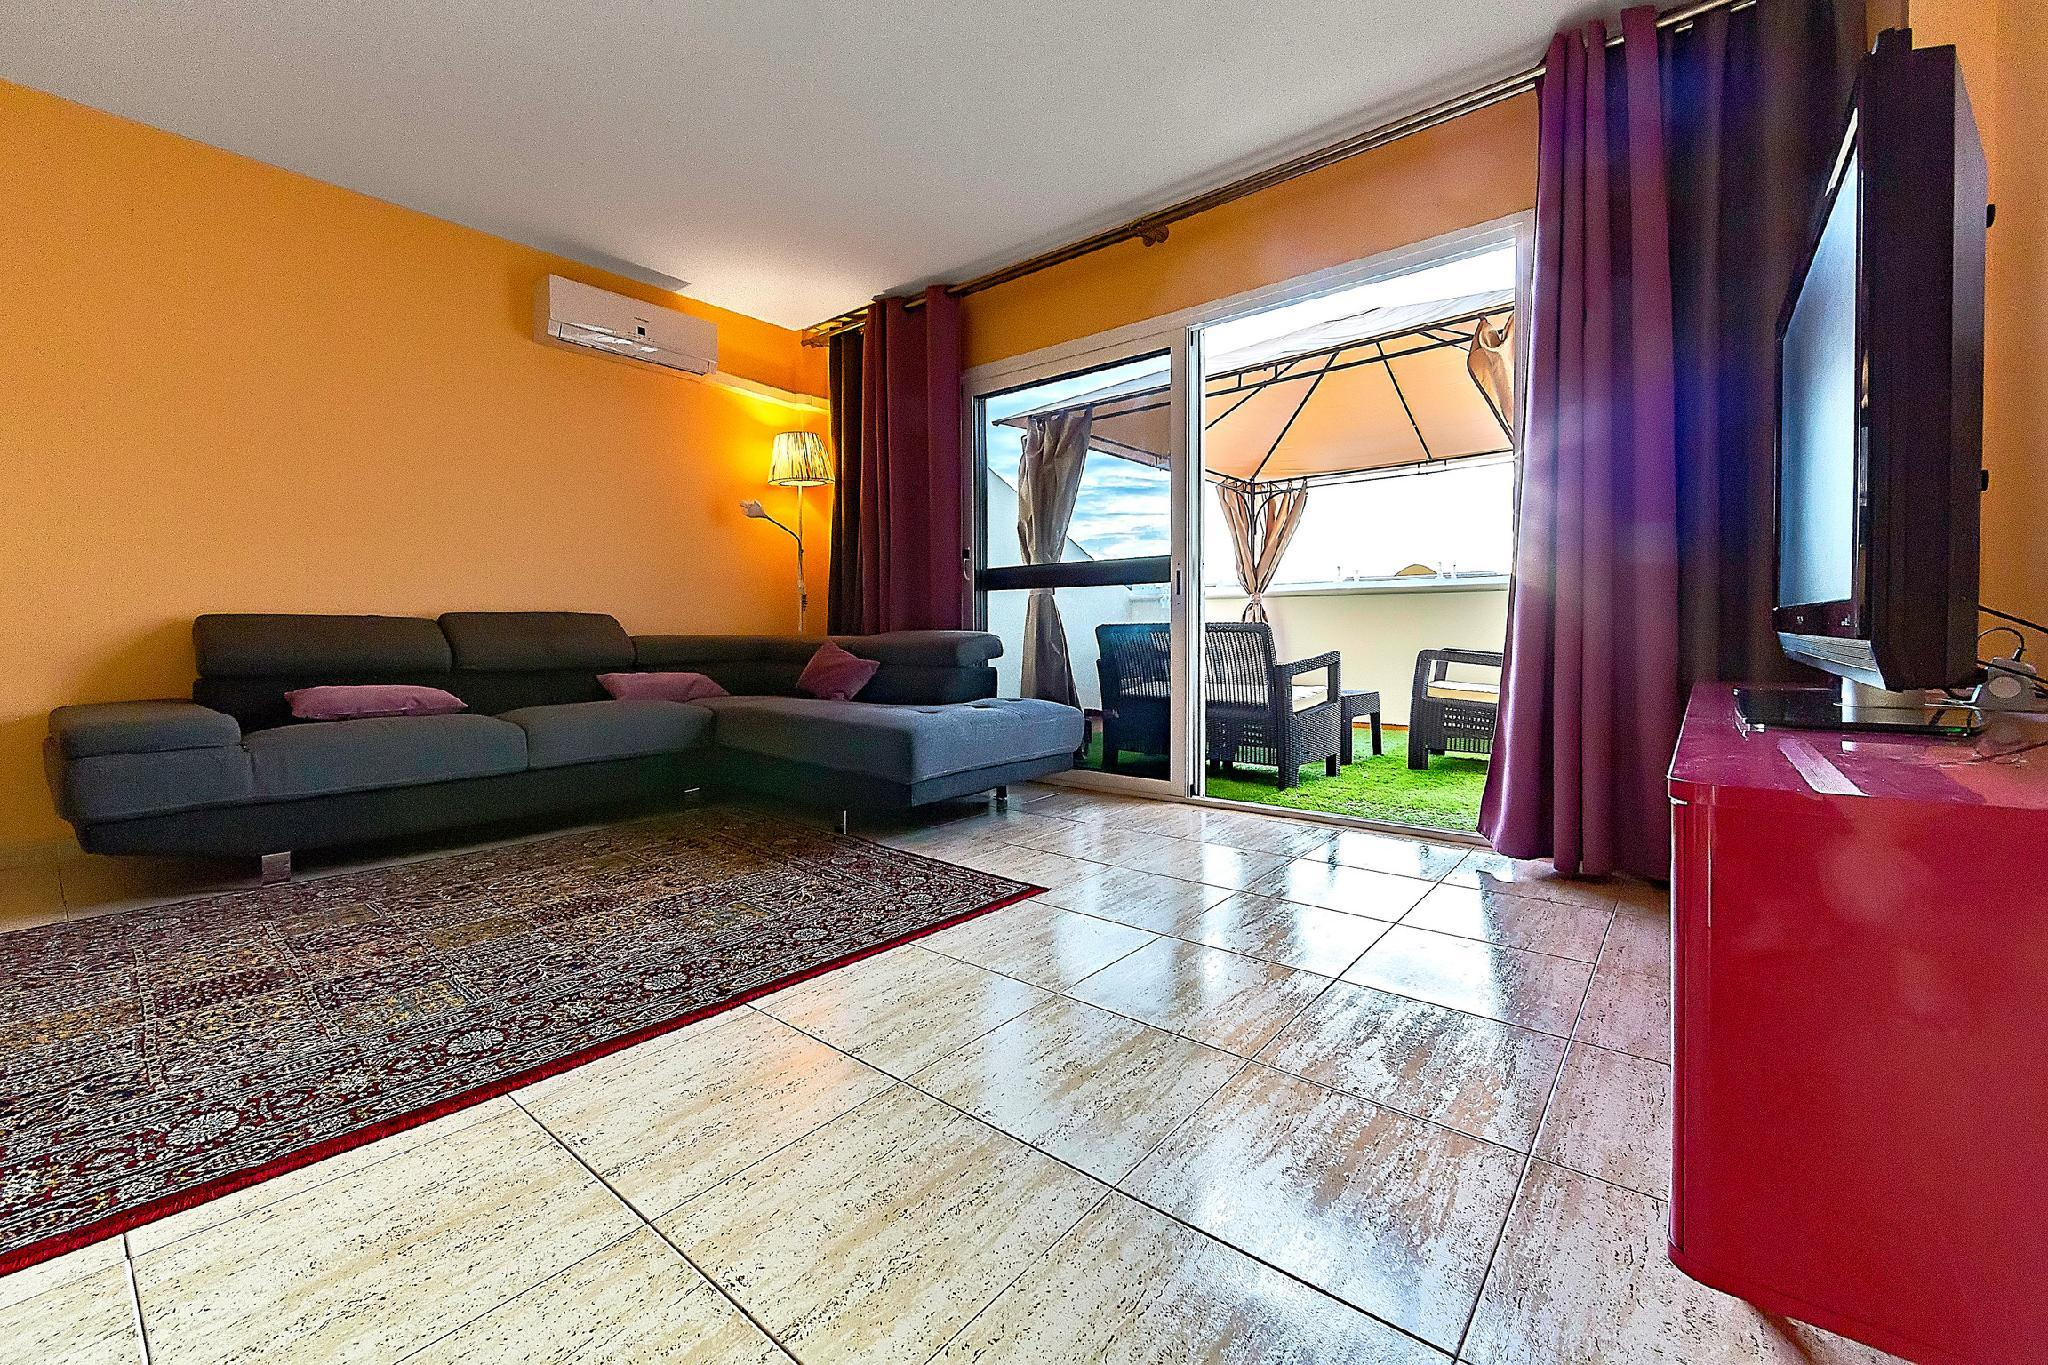 The Three Bedroom Apartment